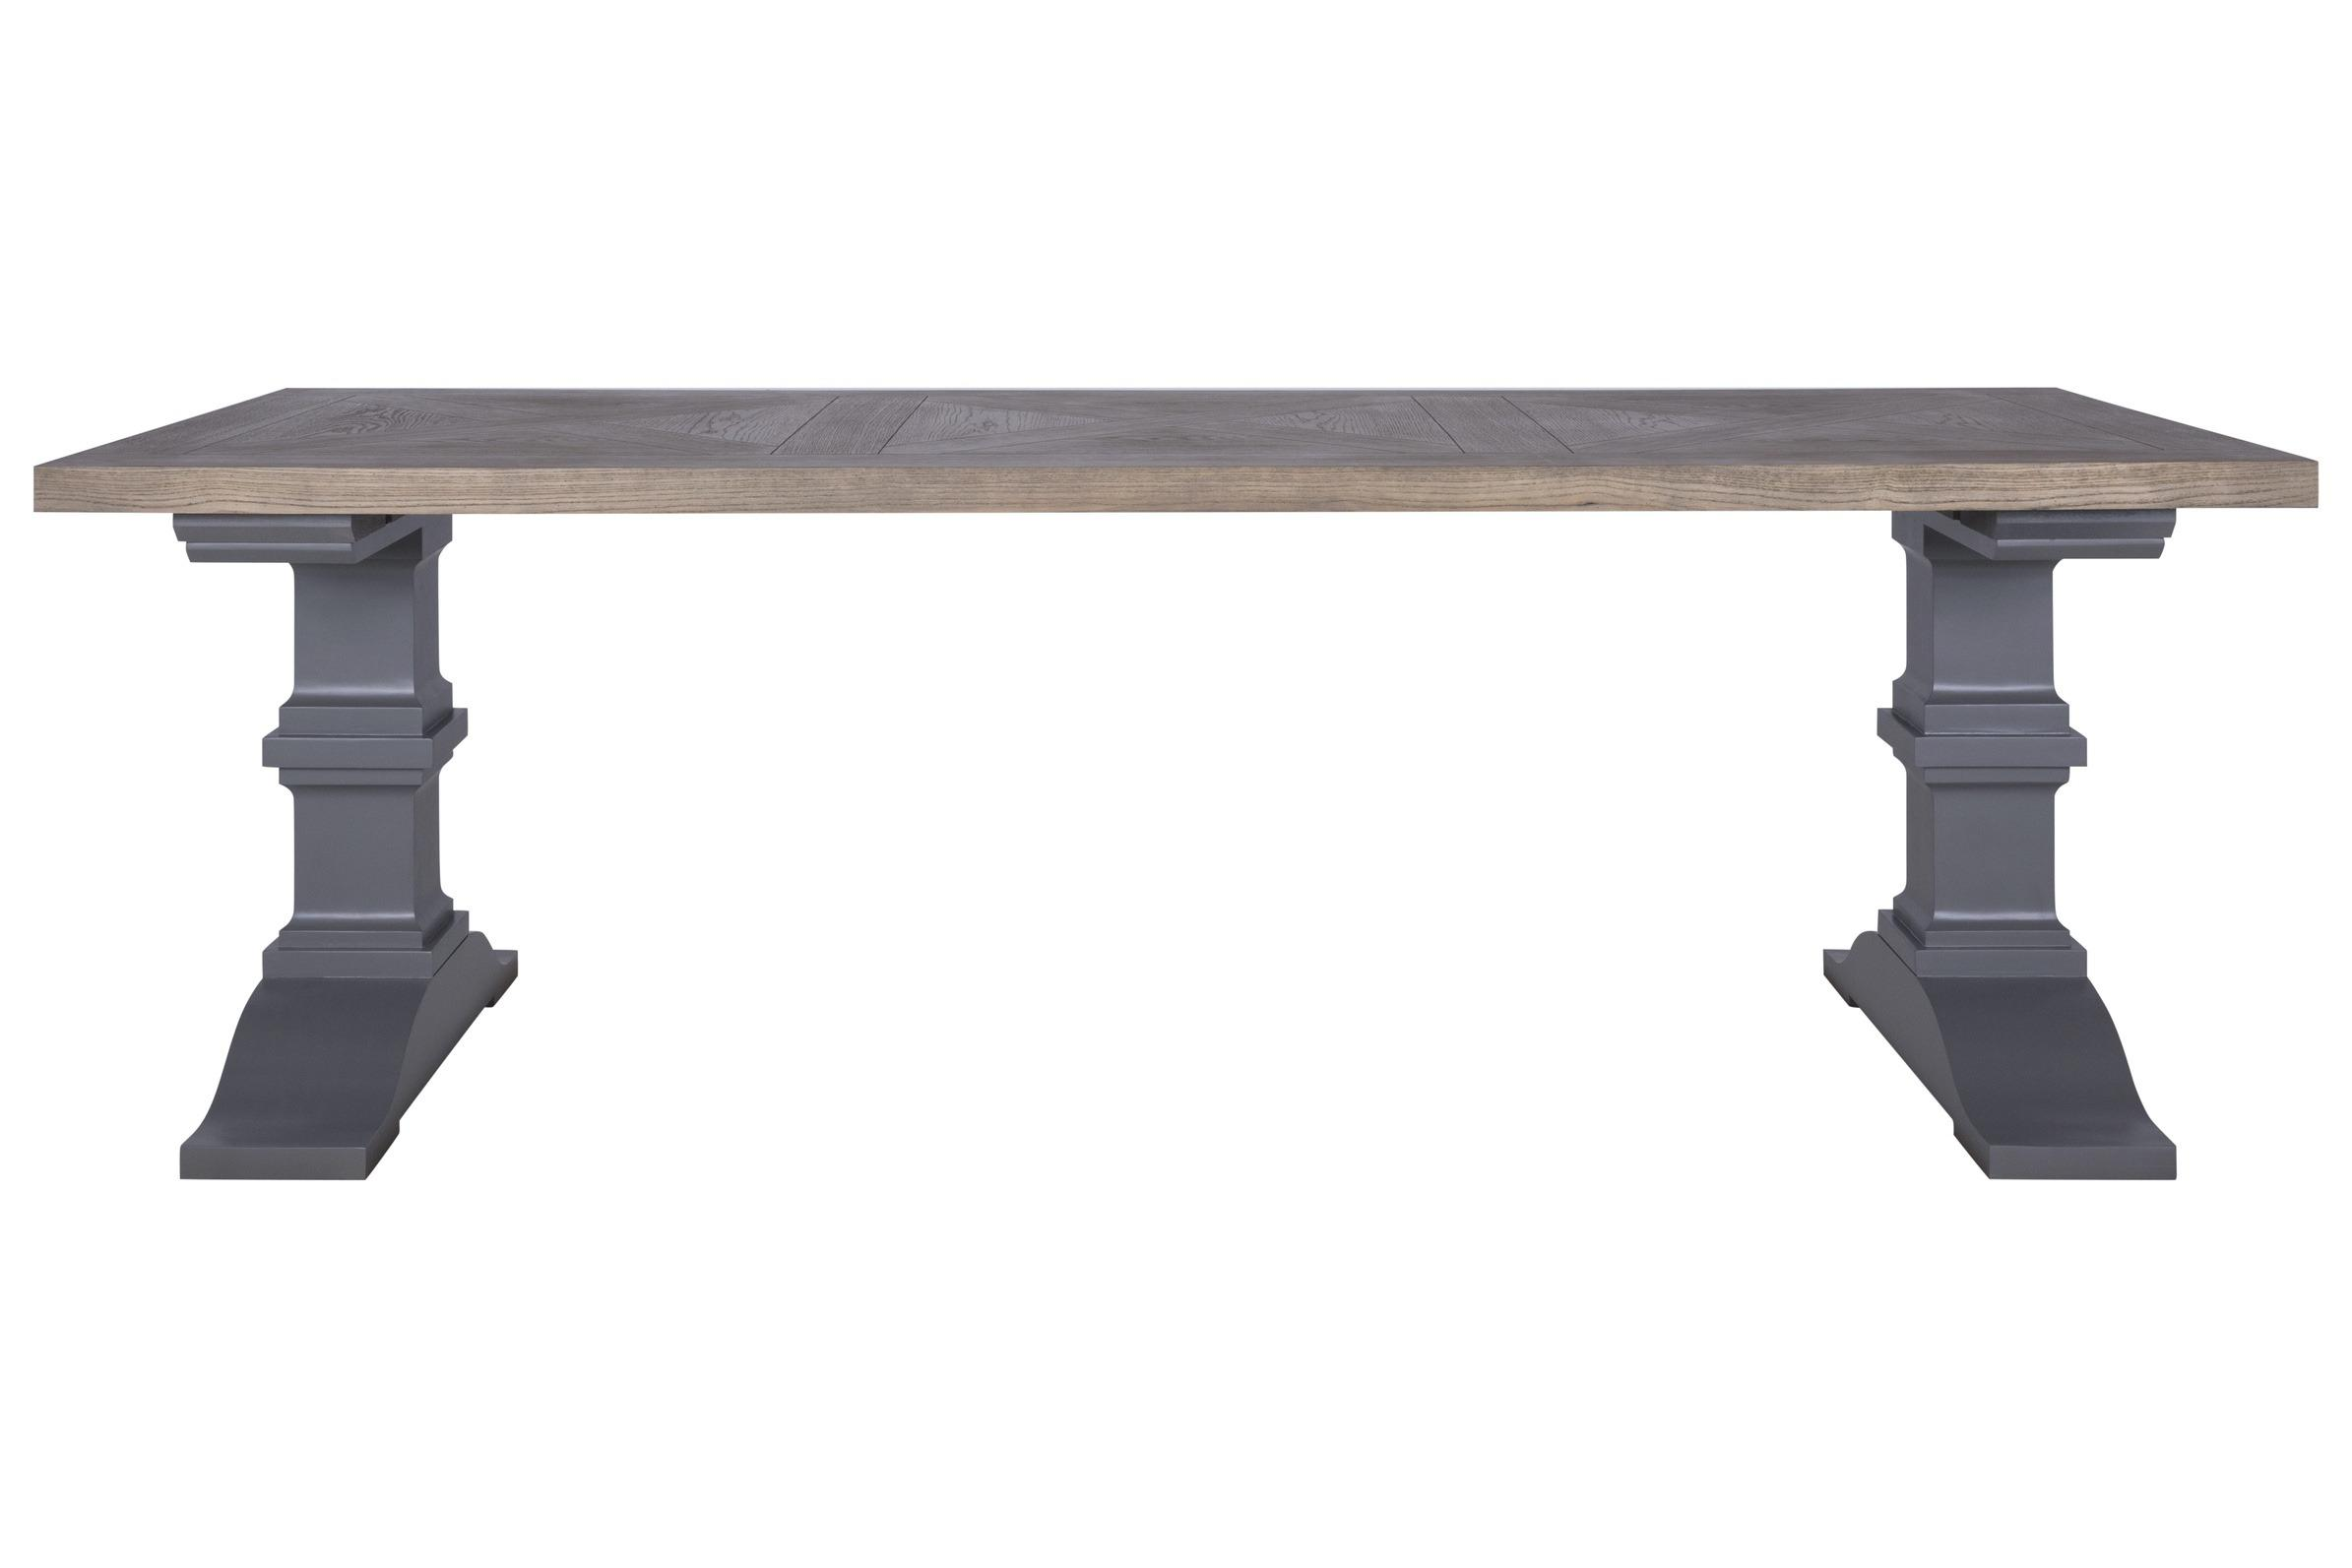 Predlžovacia doska 100cm k stolu Rosto 240-340cm